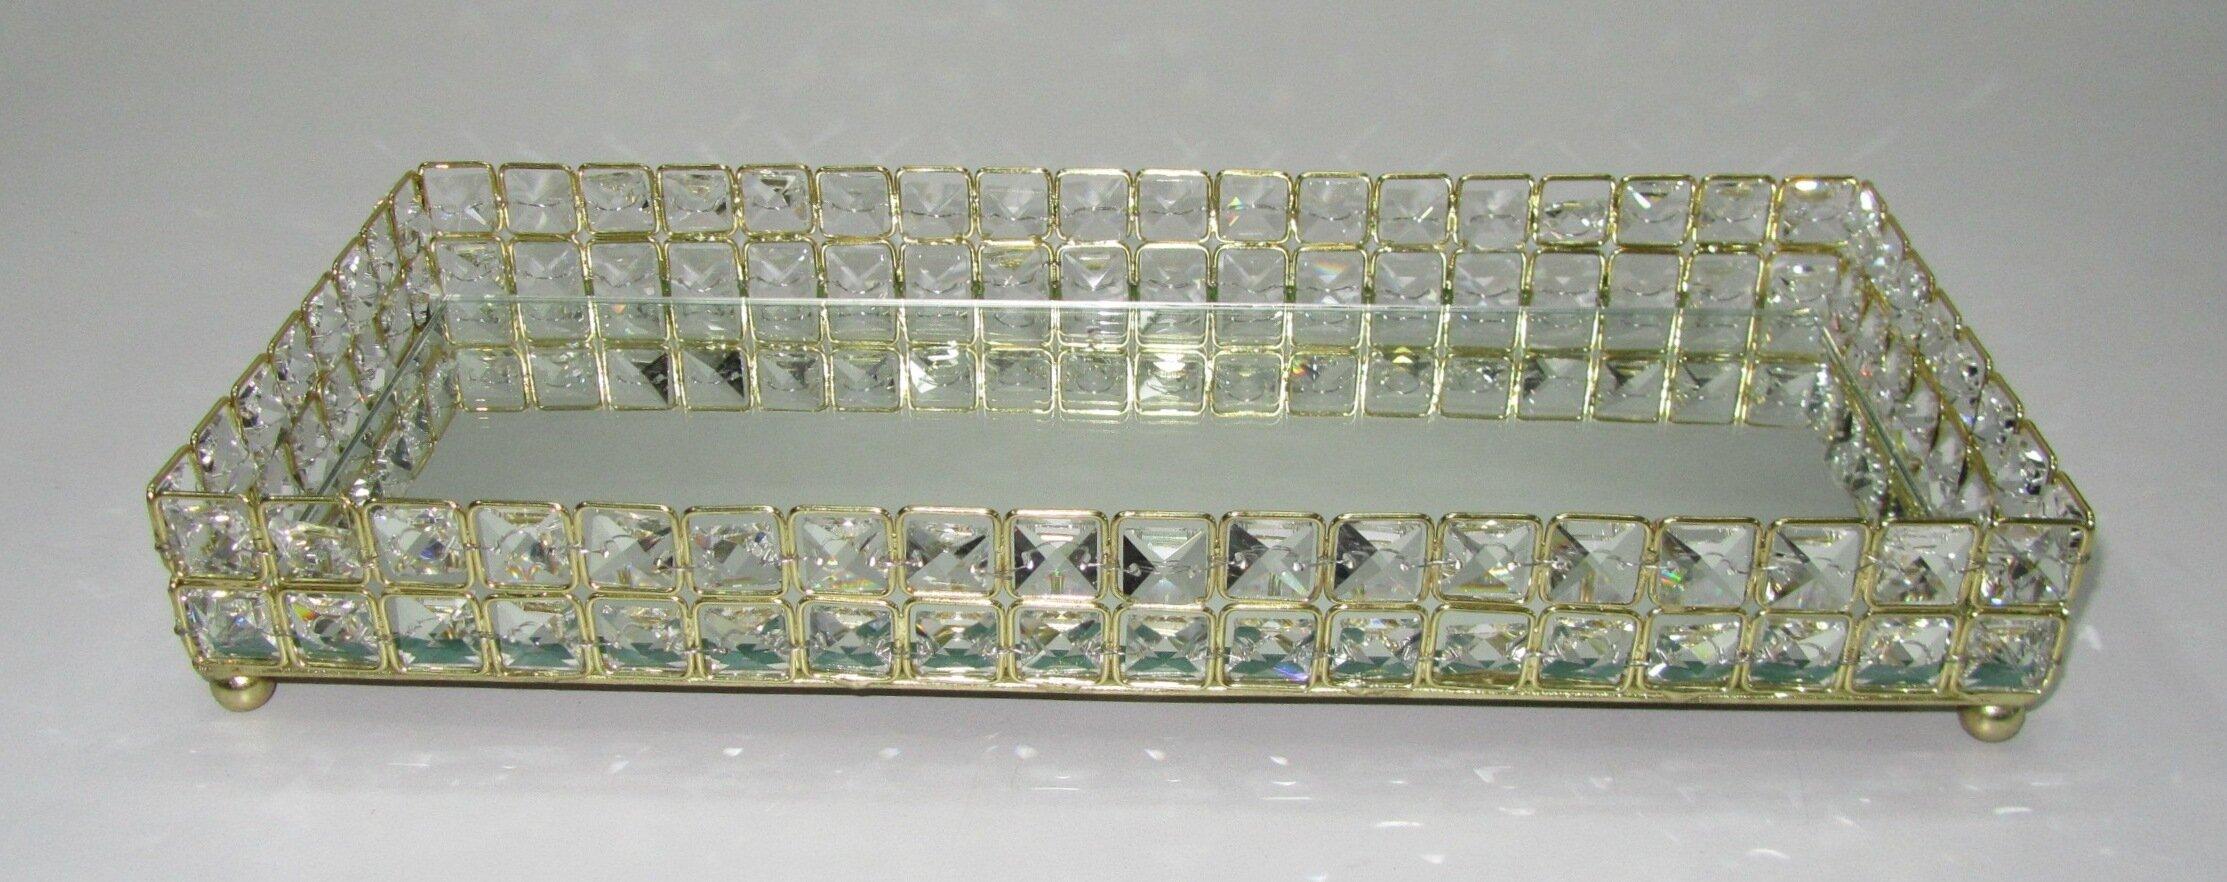 dresser bathroom perfume tray importhubviewitem rhinestone lux vanity crystal geb bella mirror